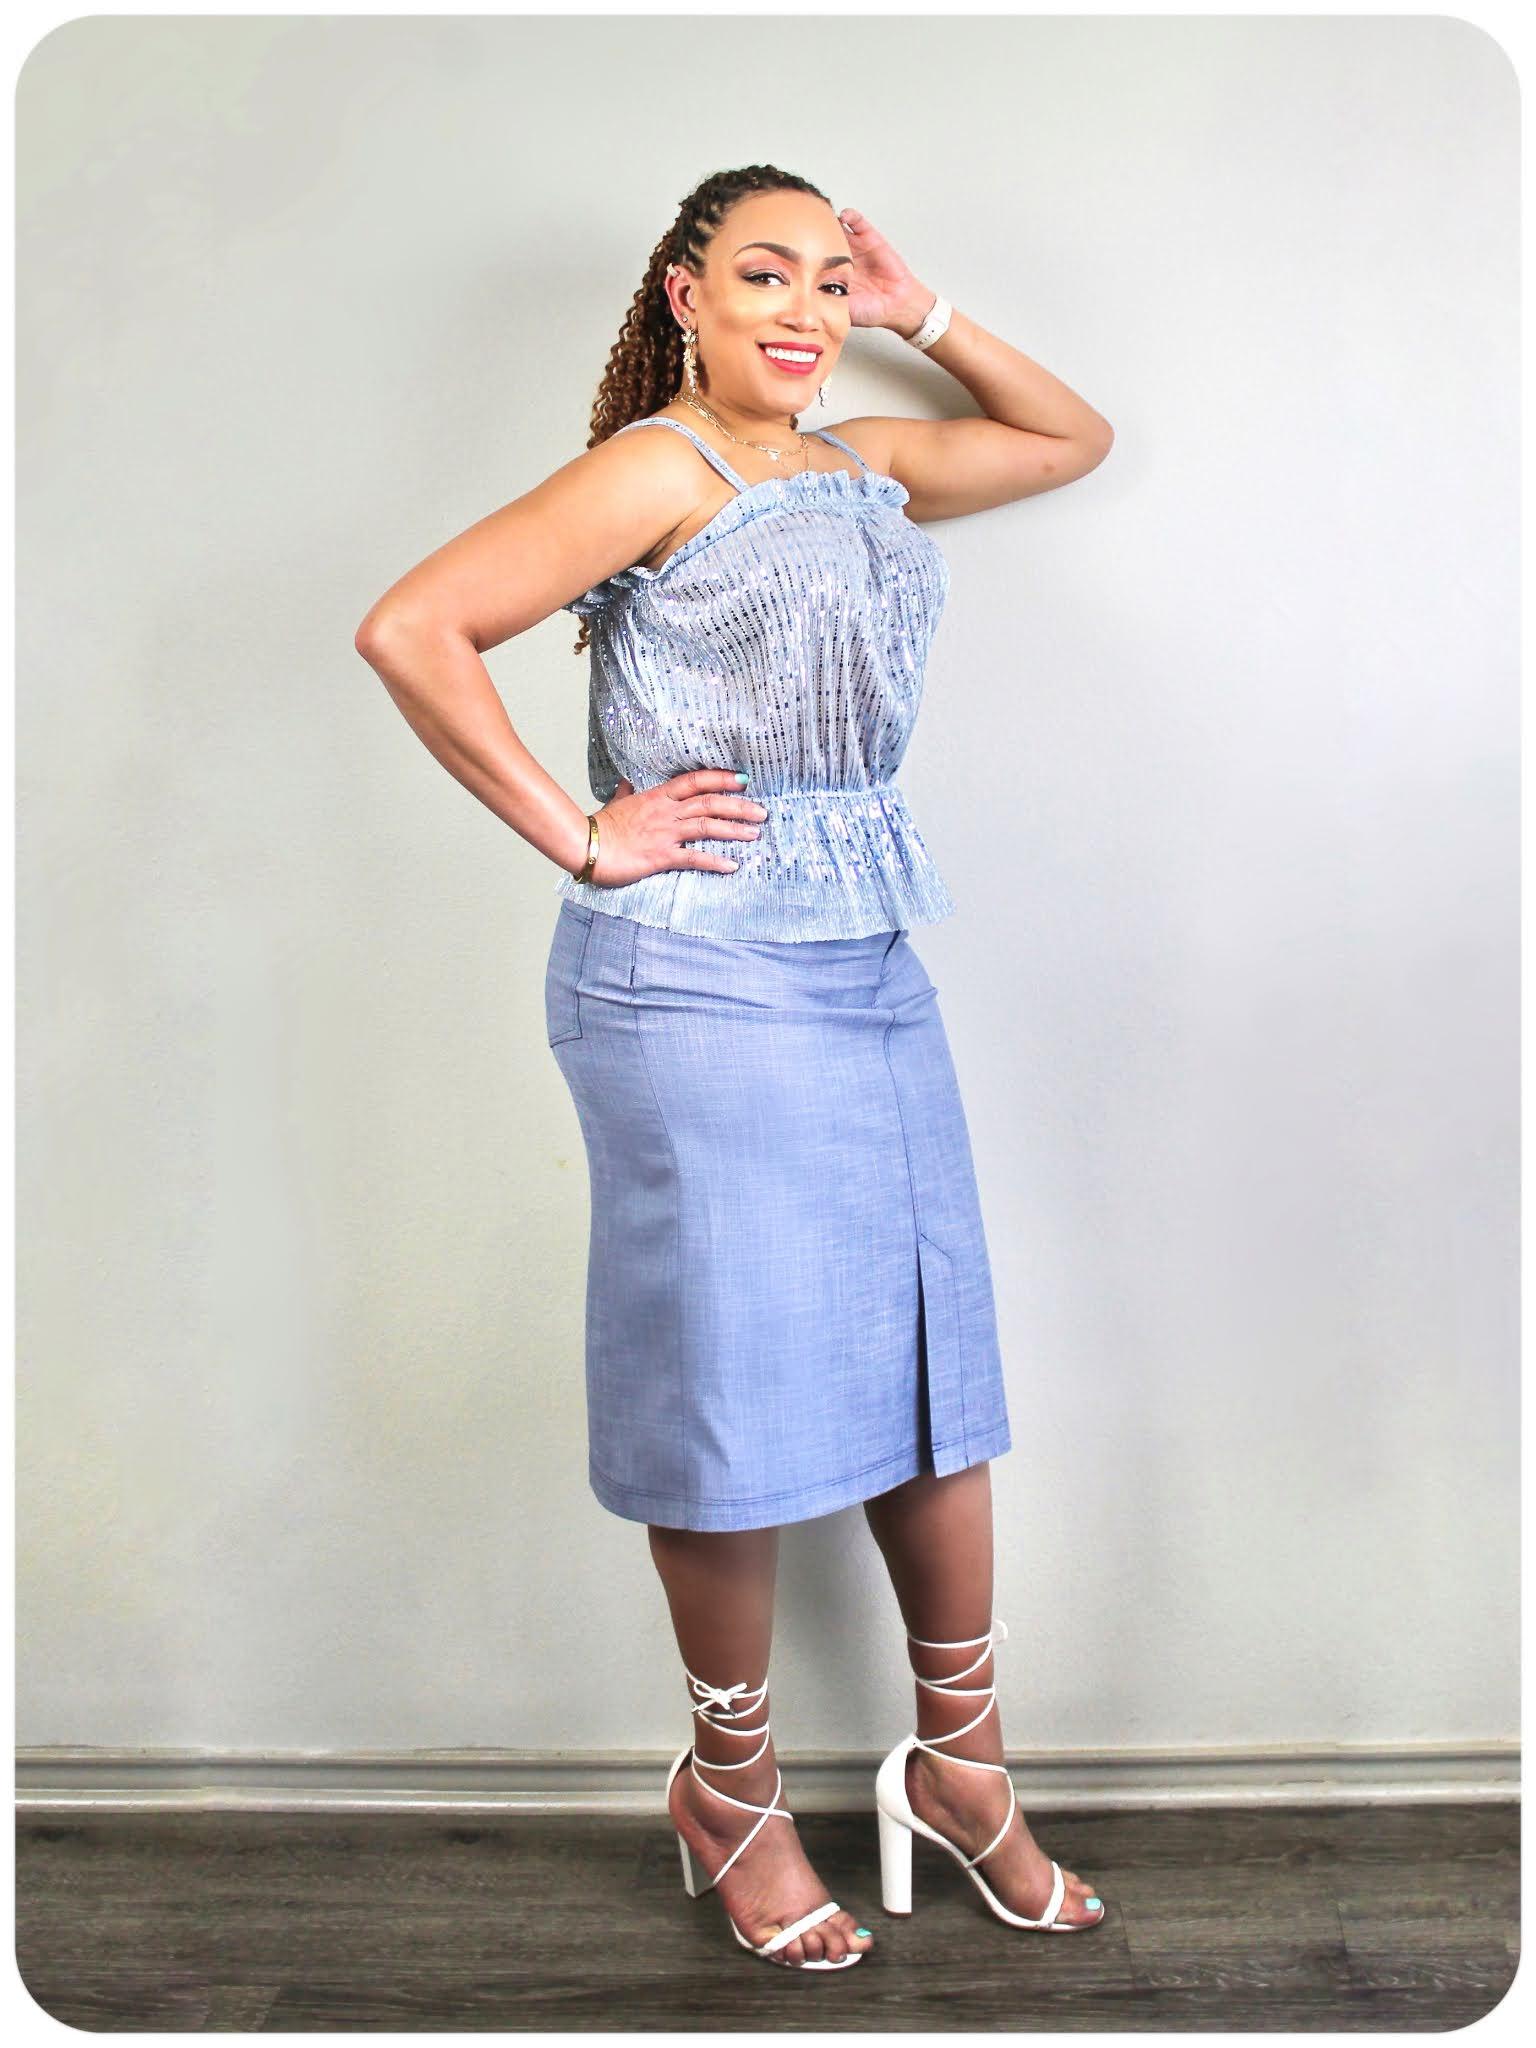 McCall's 8217 Top & McCallss 8149 Skirt - Erica Bunker DIY Style x Zelouf Fabrics